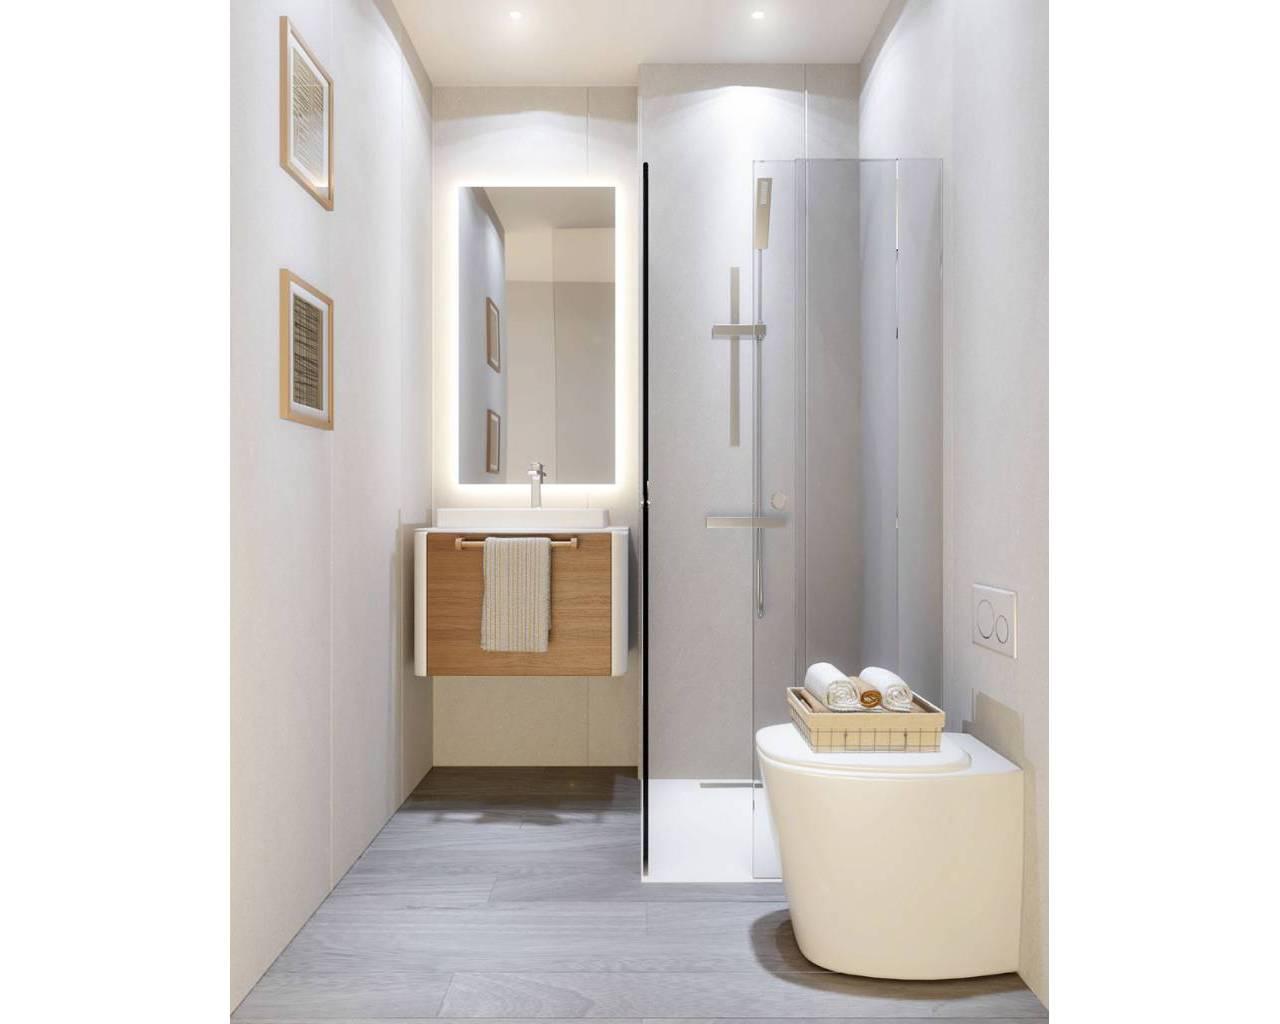 nieuwbouw-appartement-pilar-de-la-horadada_5783_xl